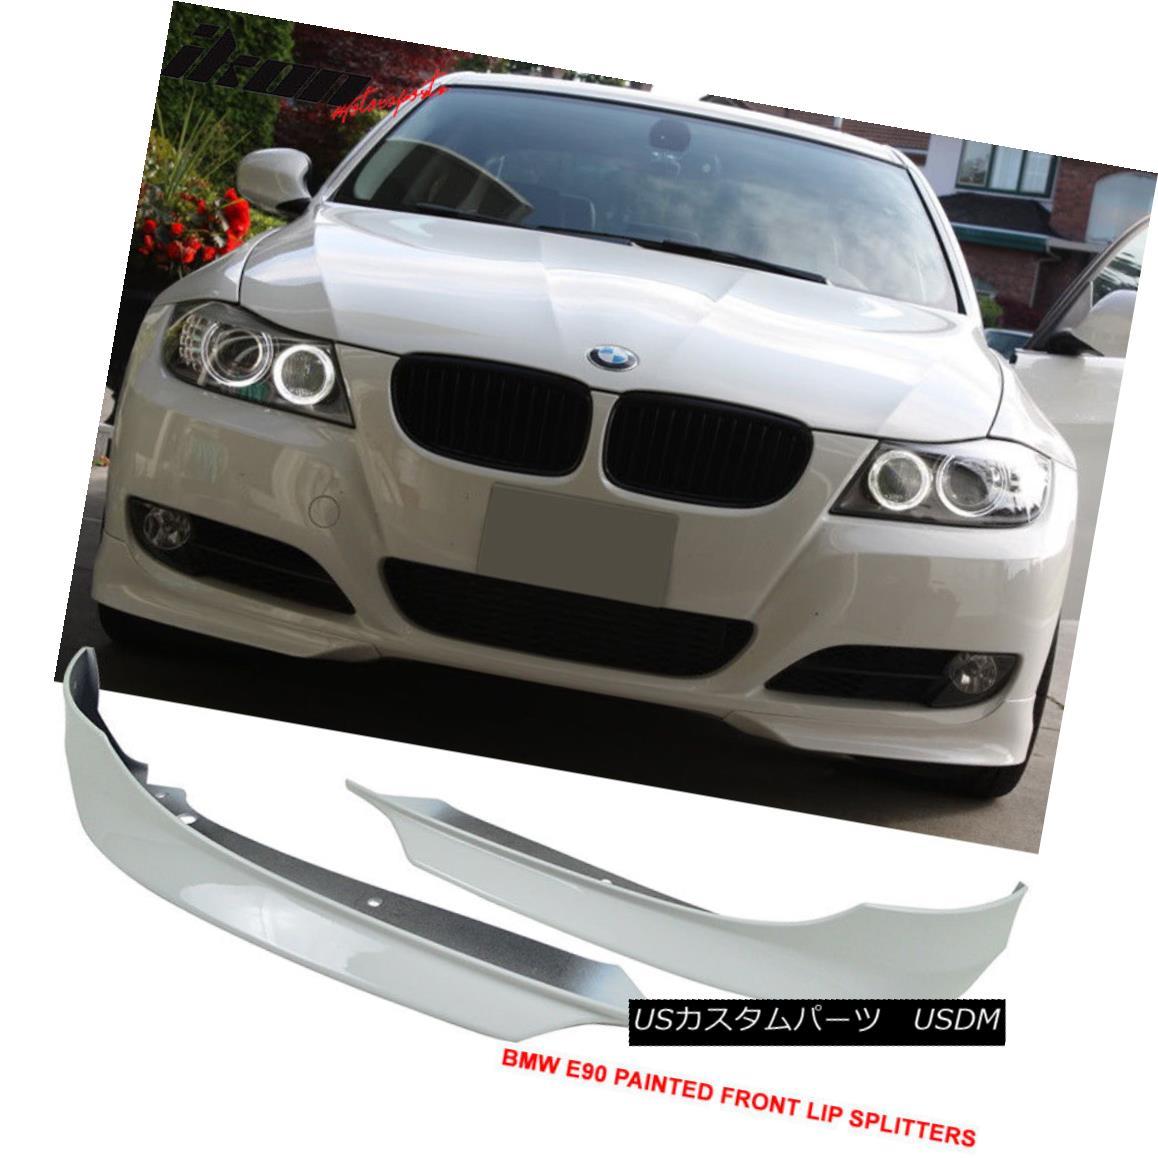 Fits 97-00 BMW E39 5 Series Front Bumper Lip Unpainted PU